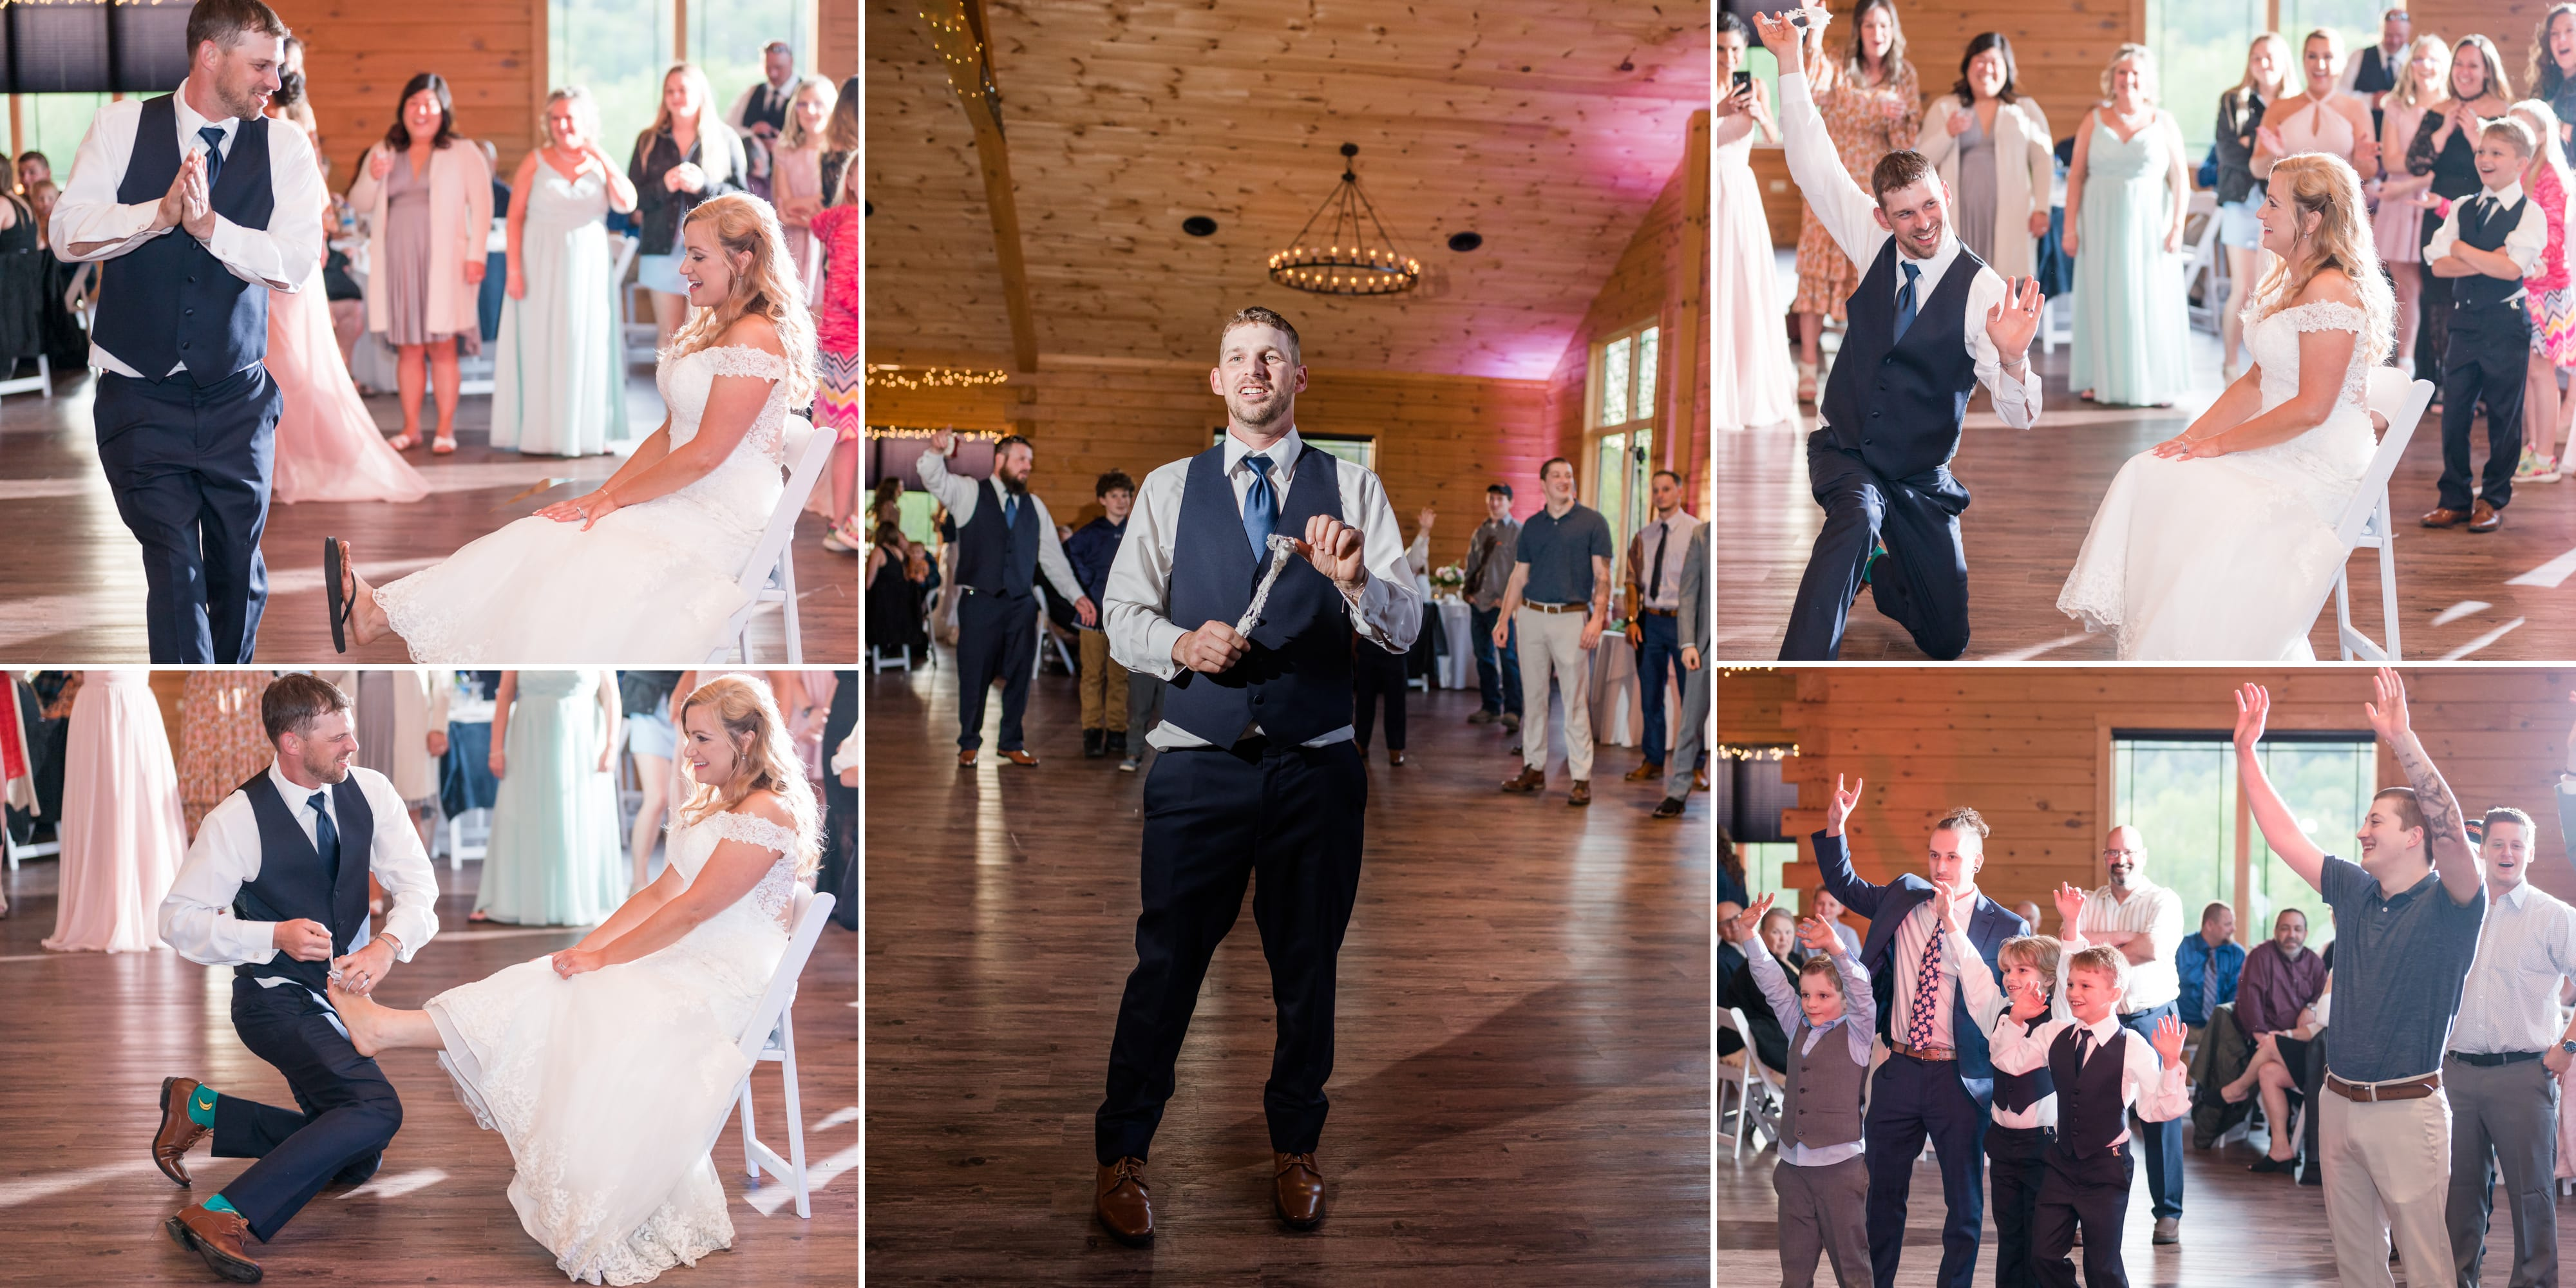 Garter toss at Rolling Rails Lodge wedding reception